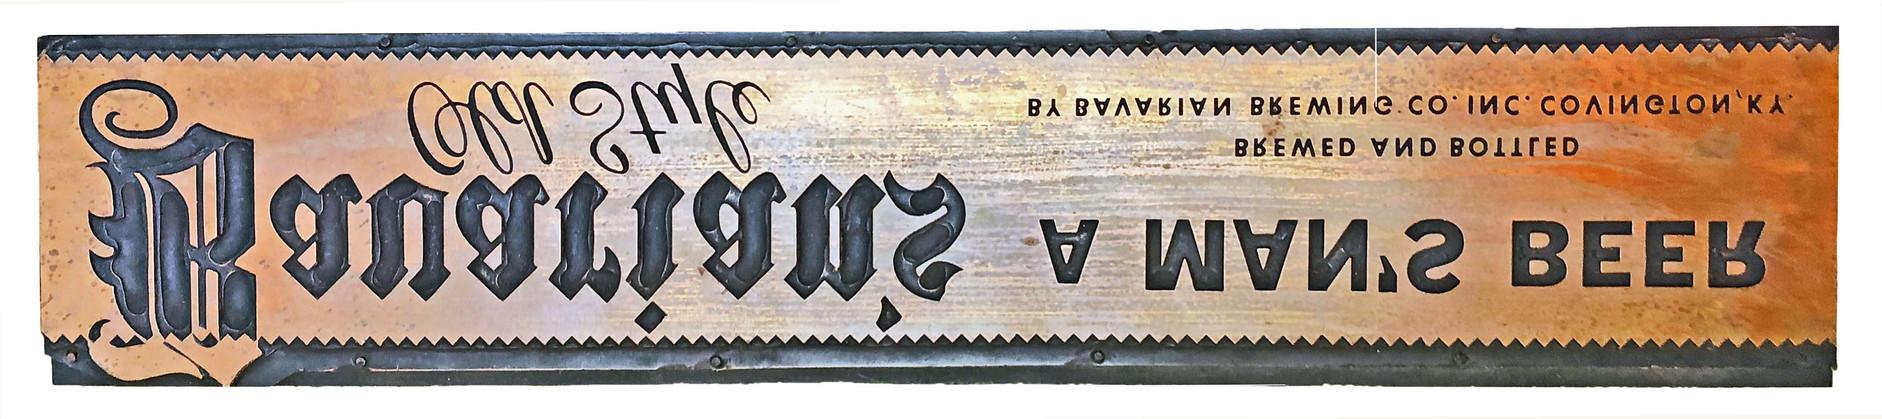 Bavarians OS Reverse Print2a.jpg